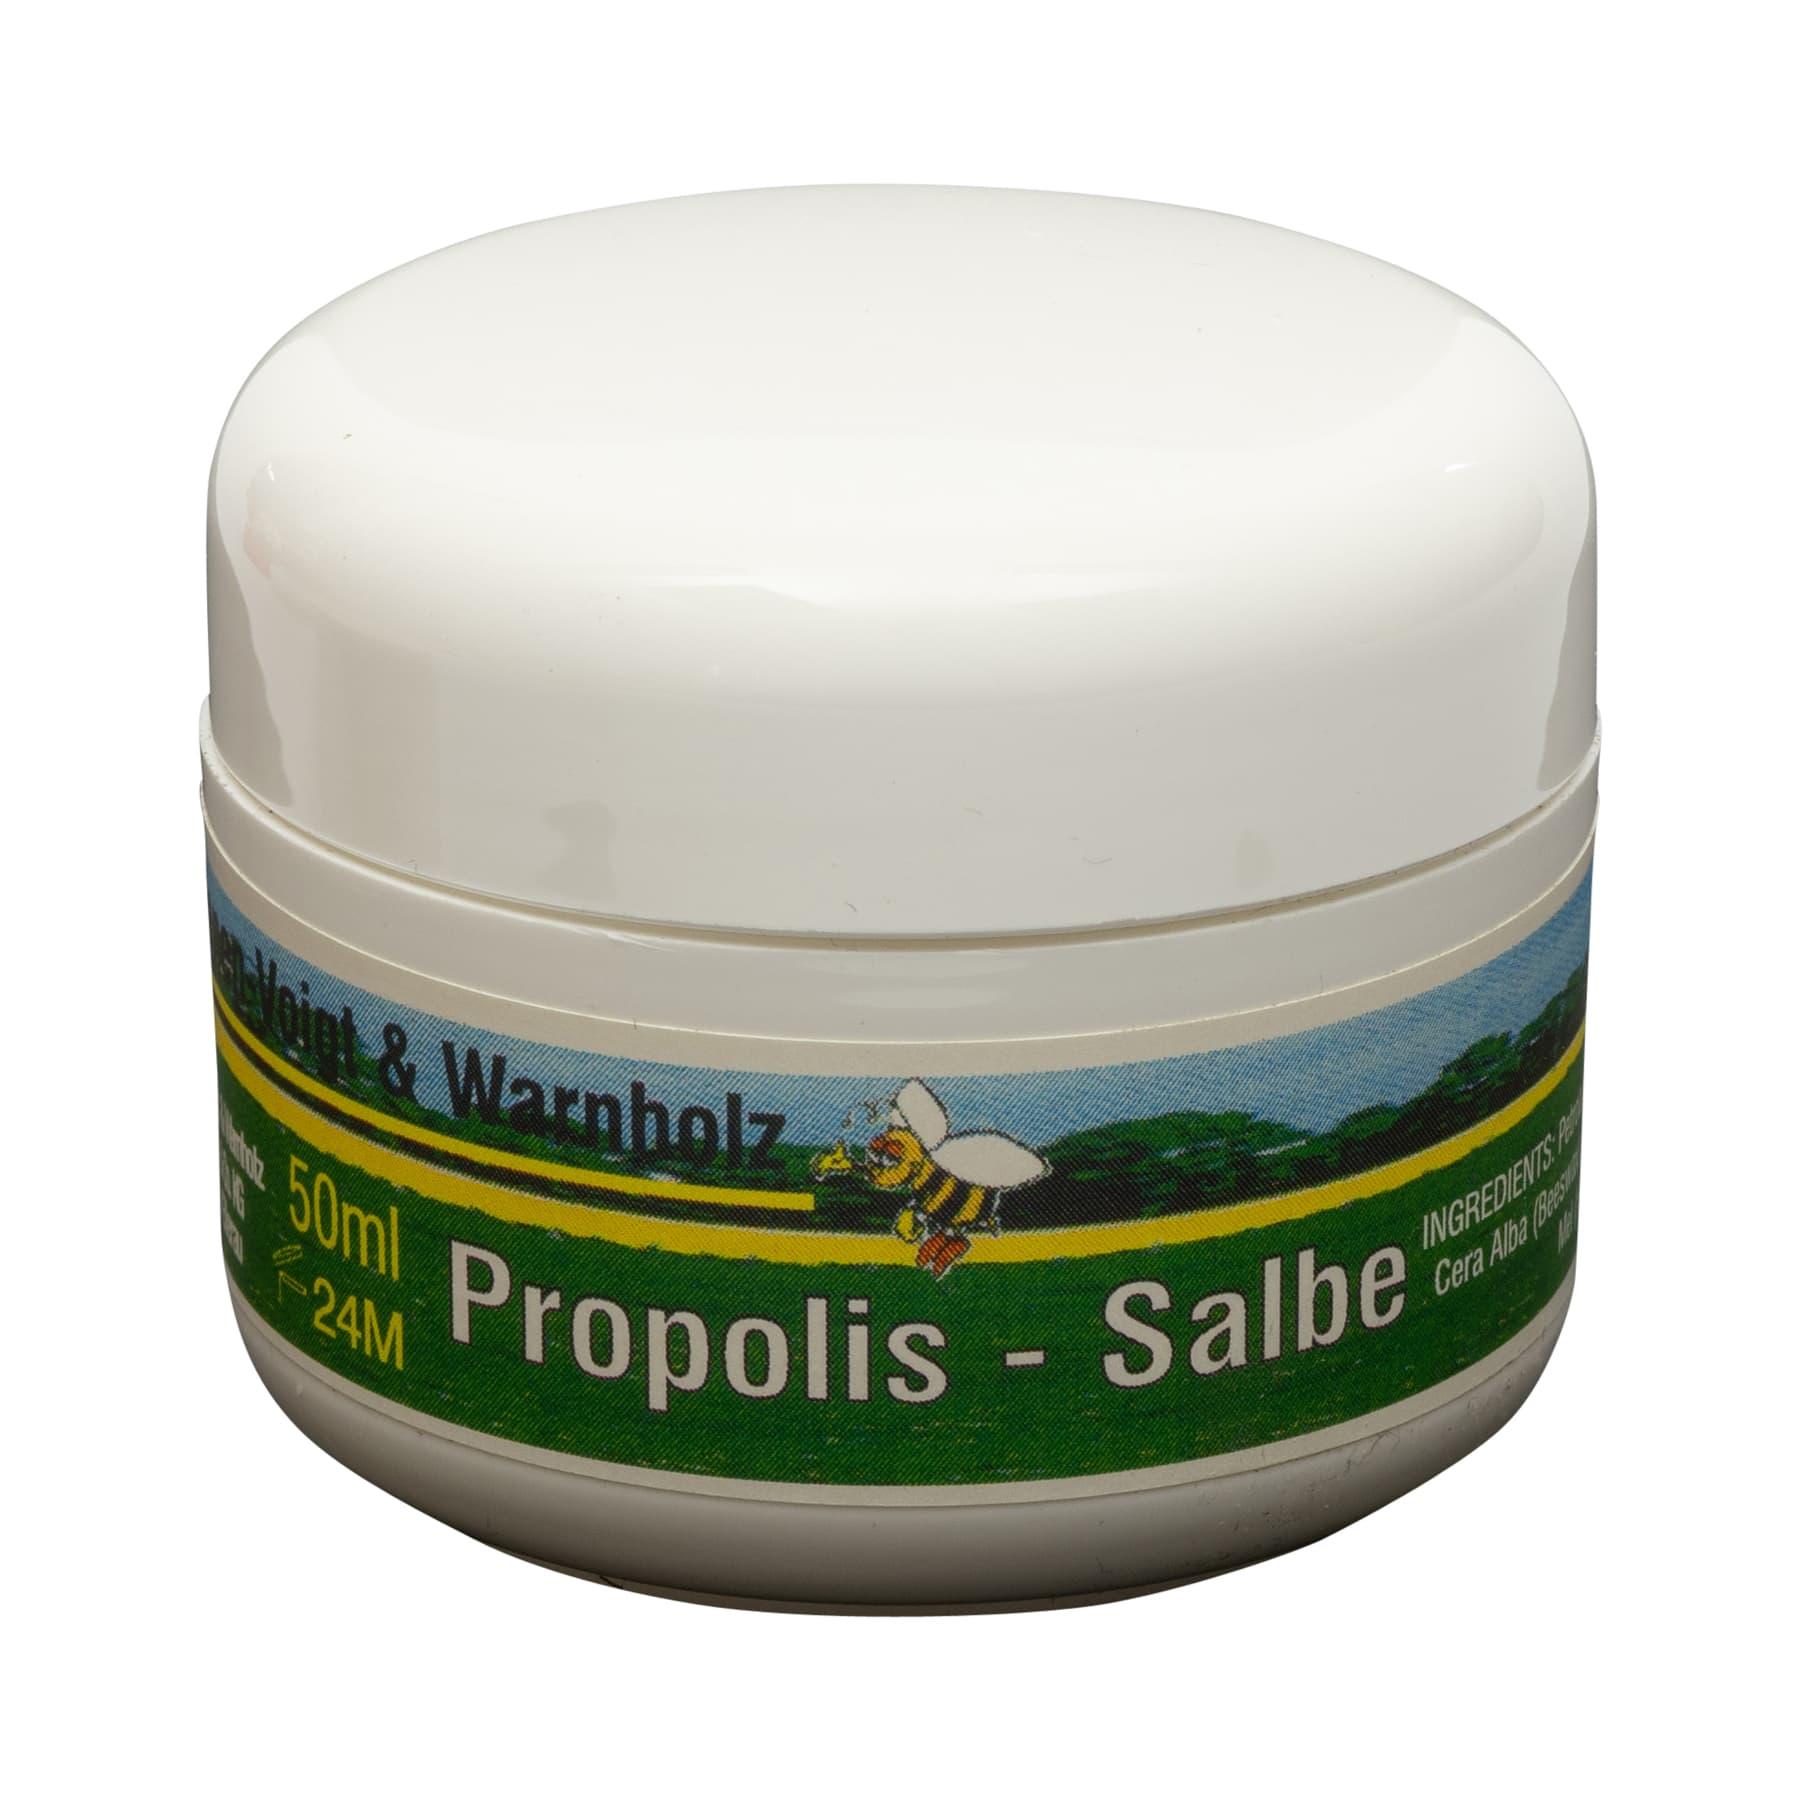 Propolissalbe 50 ml sehr dunkel